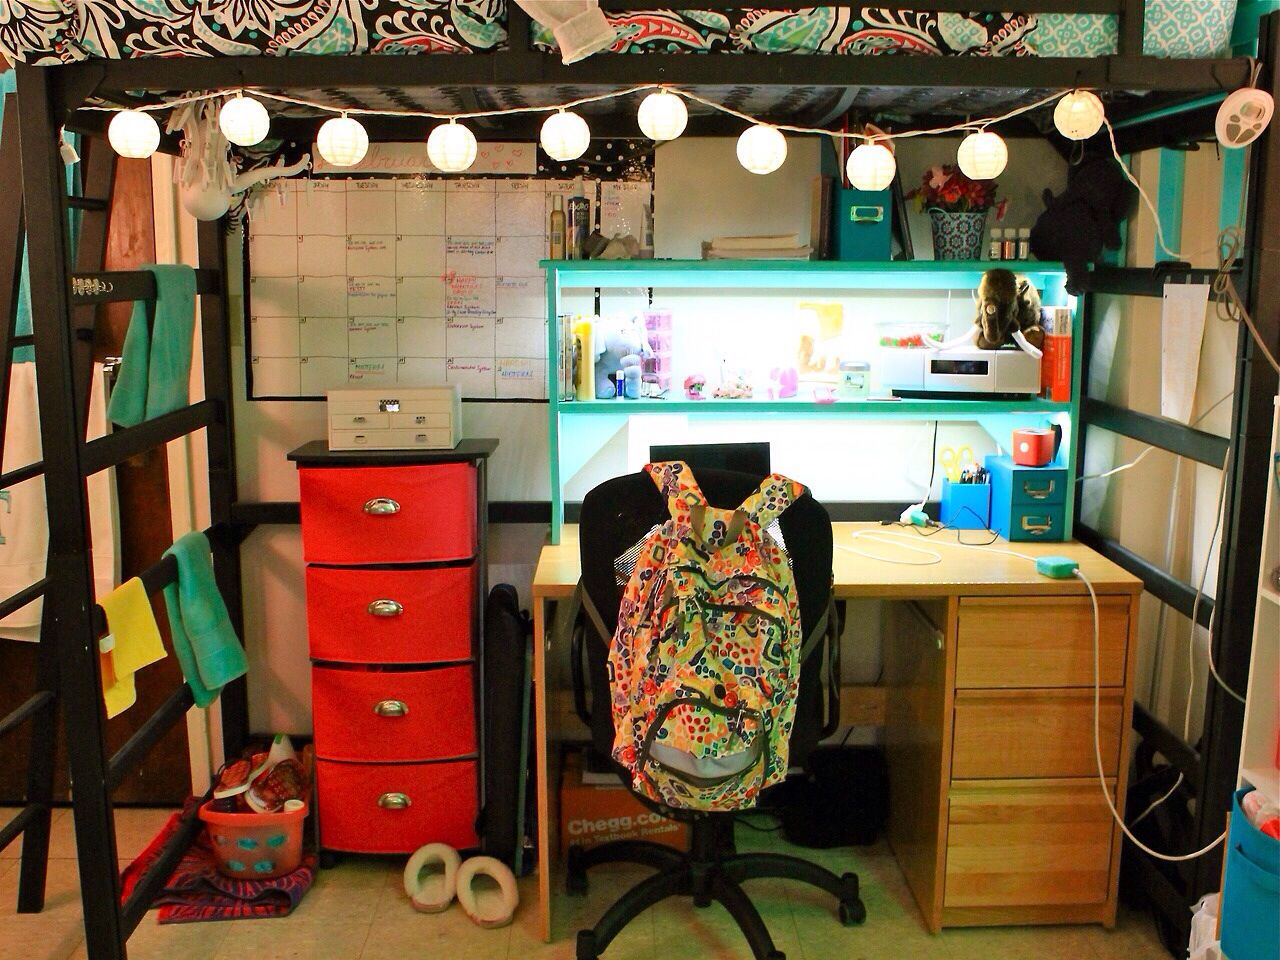 Medium Crop Of College Room Setup